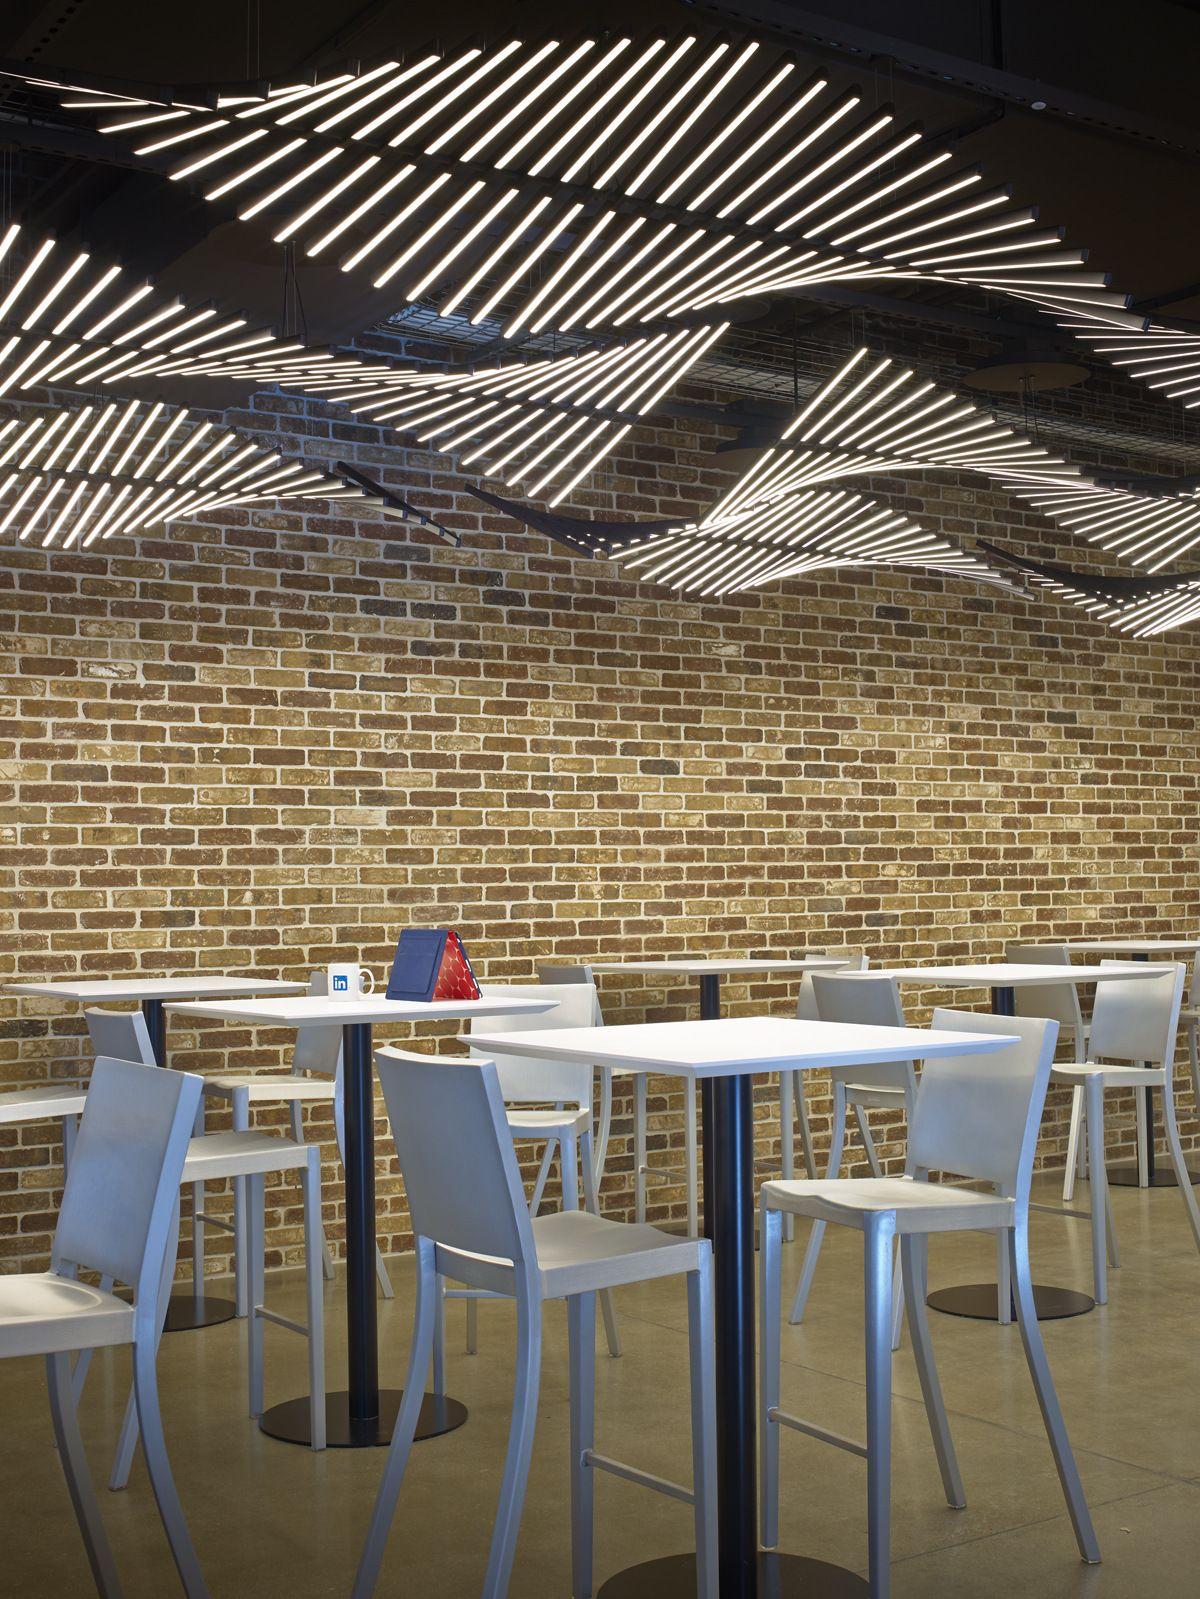 Office Tour Linkedin Sunnyvale Campus Ceiling Design